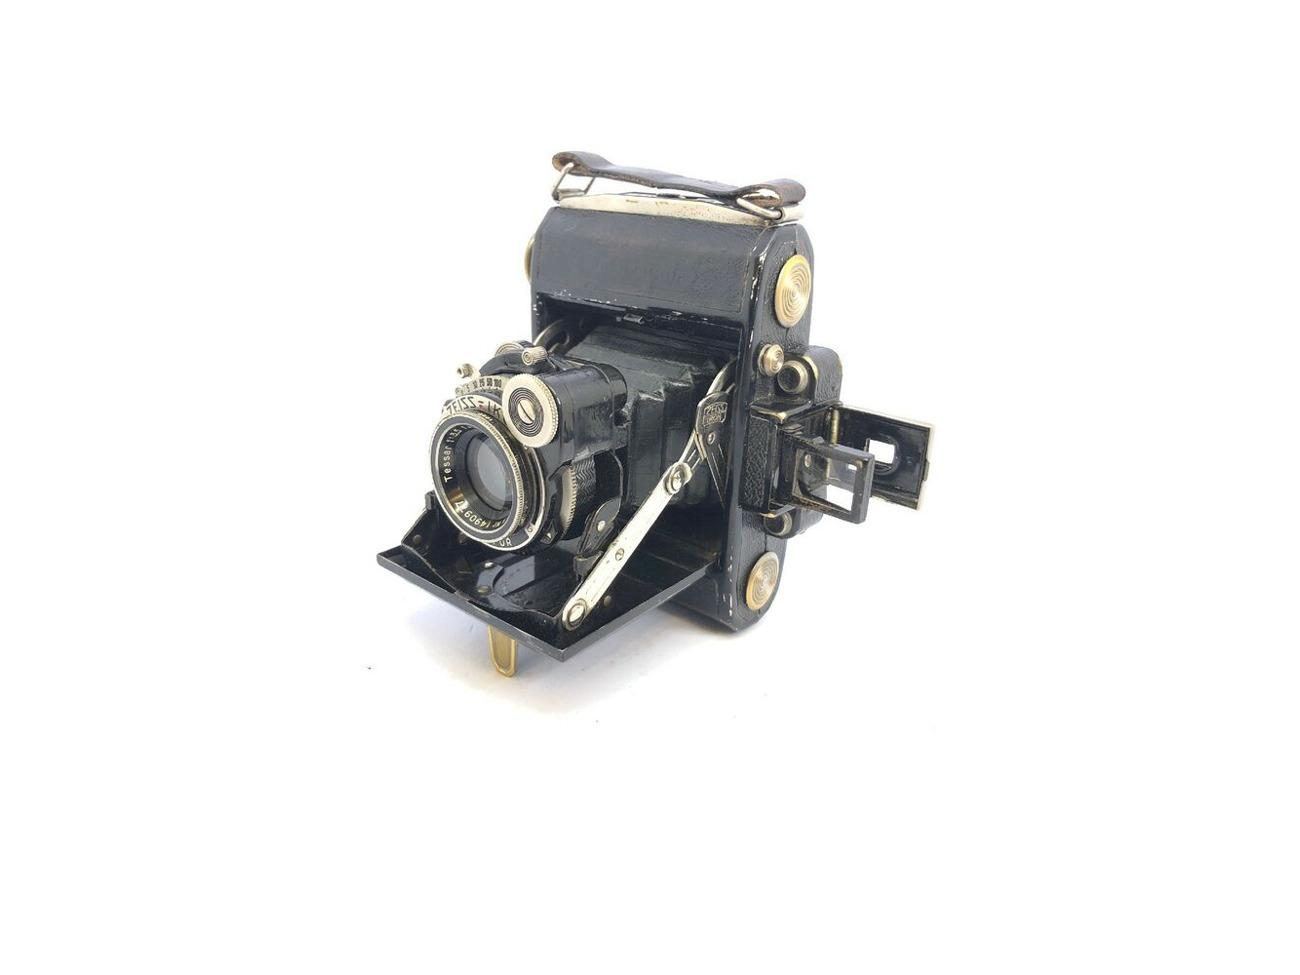 ZEISS IKON Super Ikonta (A) 530 Camera c 1934-37 w/ 1:3 5/7cm Tessar Lens  #434